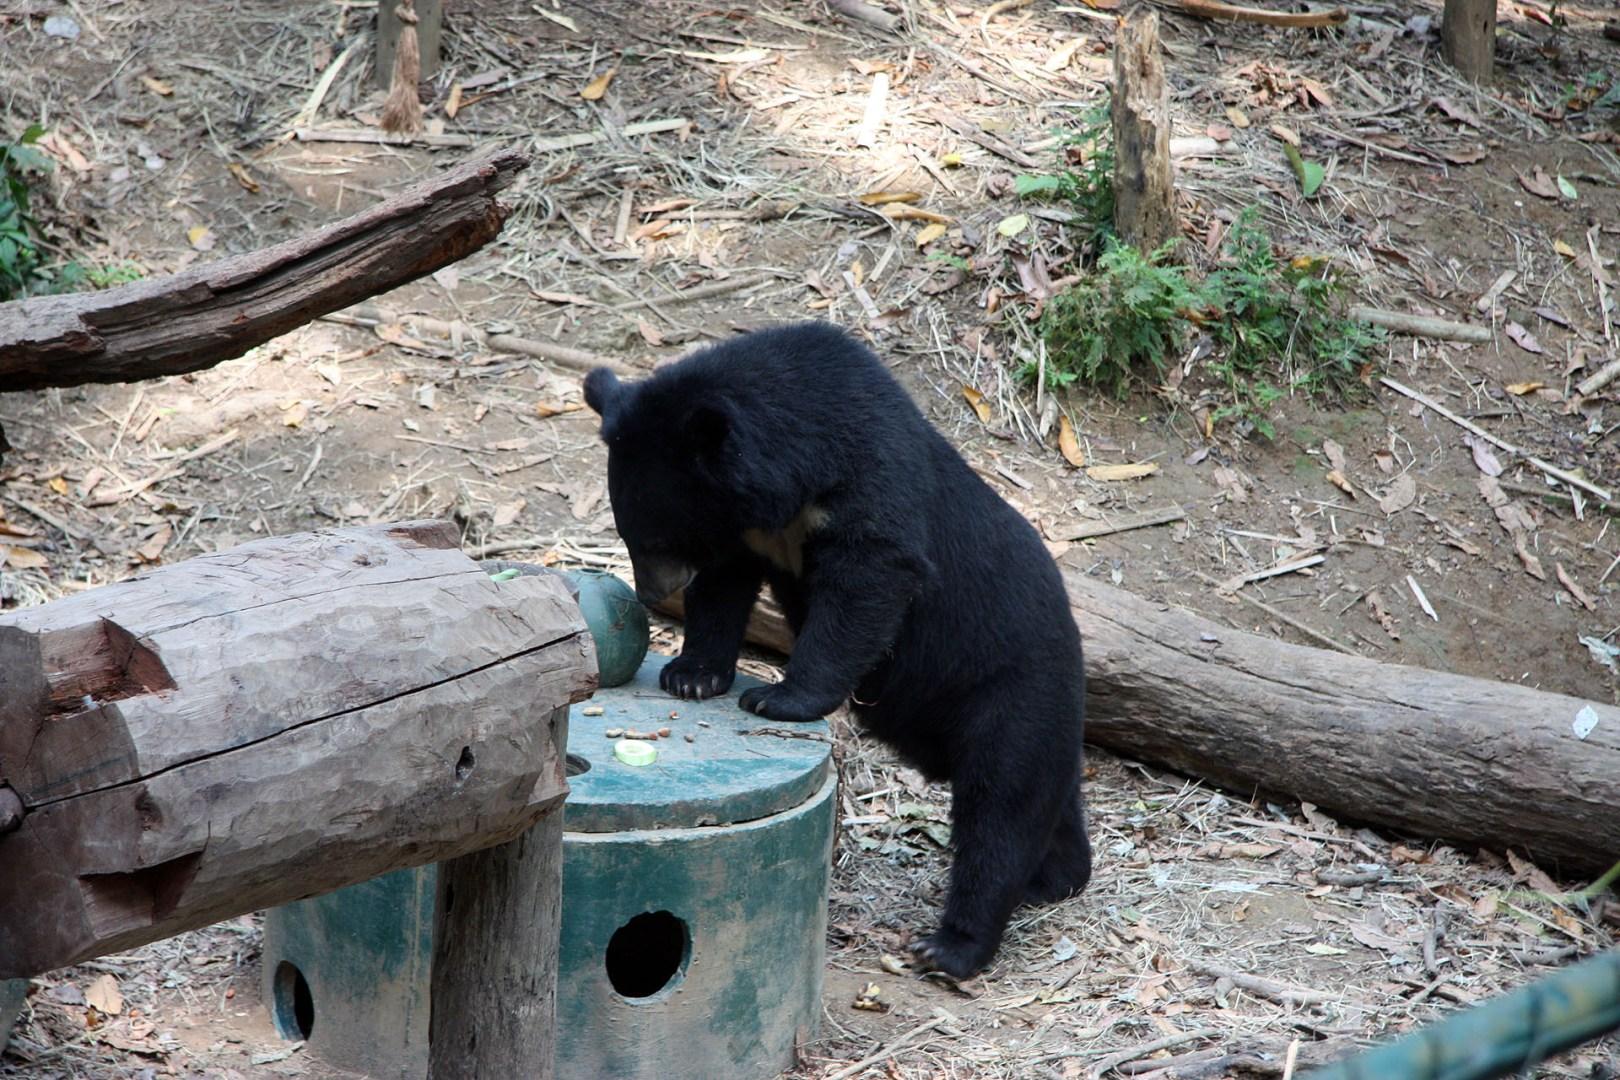 Bear rescue centre